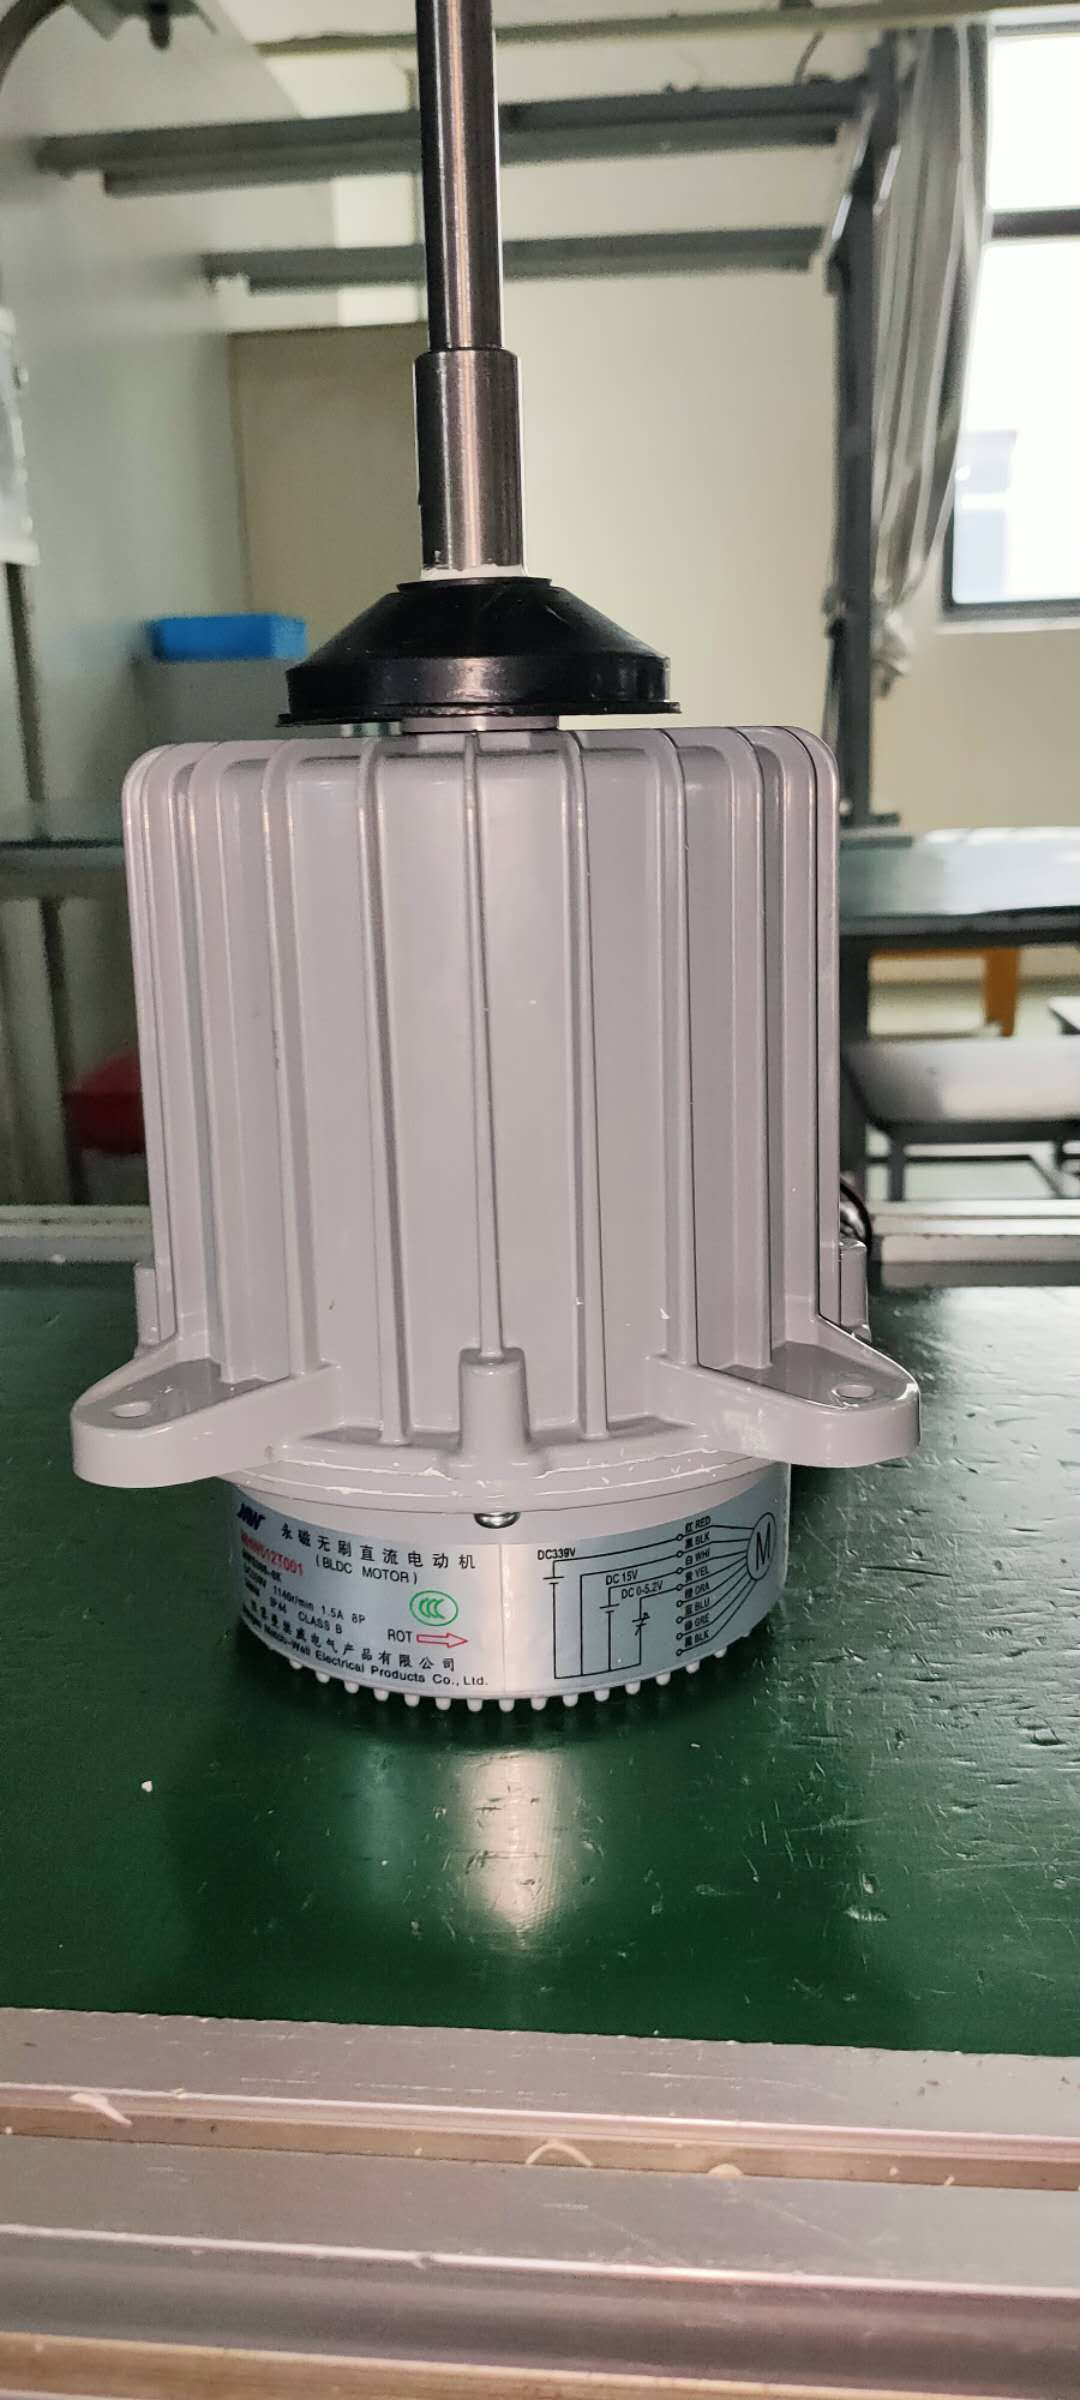 MWS Series Brushless DC Motors enlarge